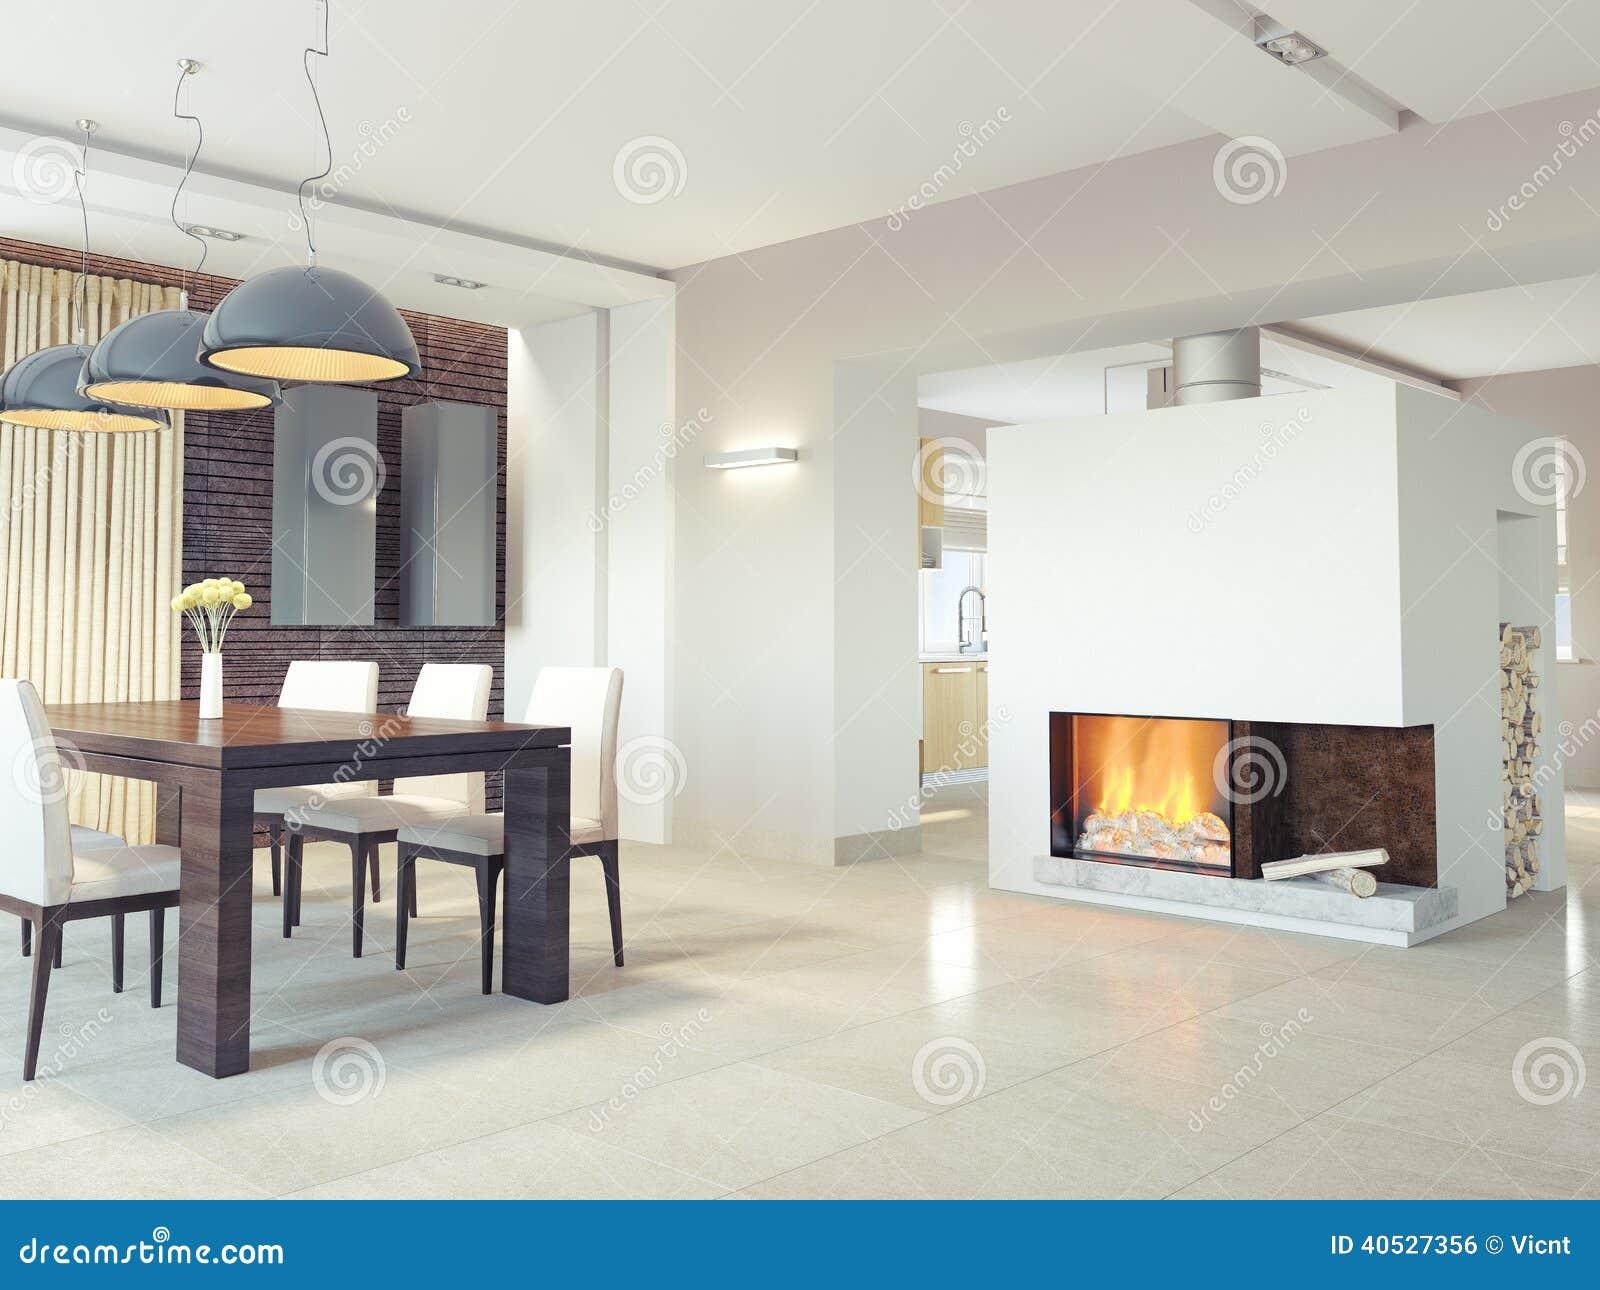 Sala Da Pranzo Moderna Illustrazione Di Stock Immagine: 40527356 #A55F26 1300 1065 Sala Da Pranzo Arte Contemporanea